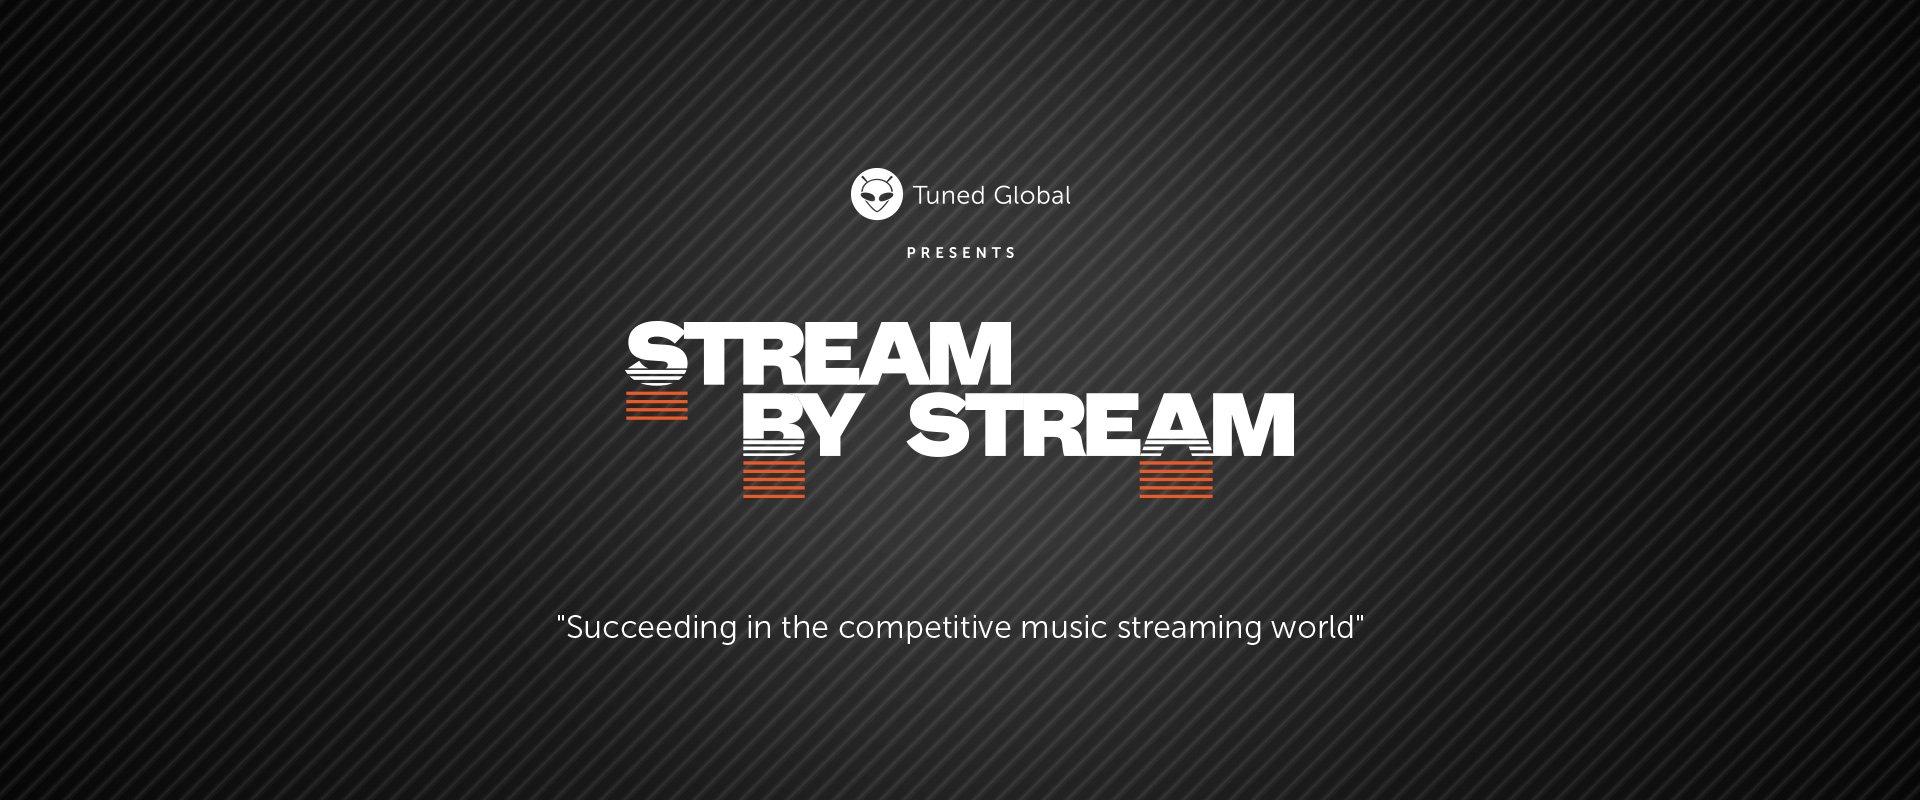 stream-by-stream-tunedglobal-banner2